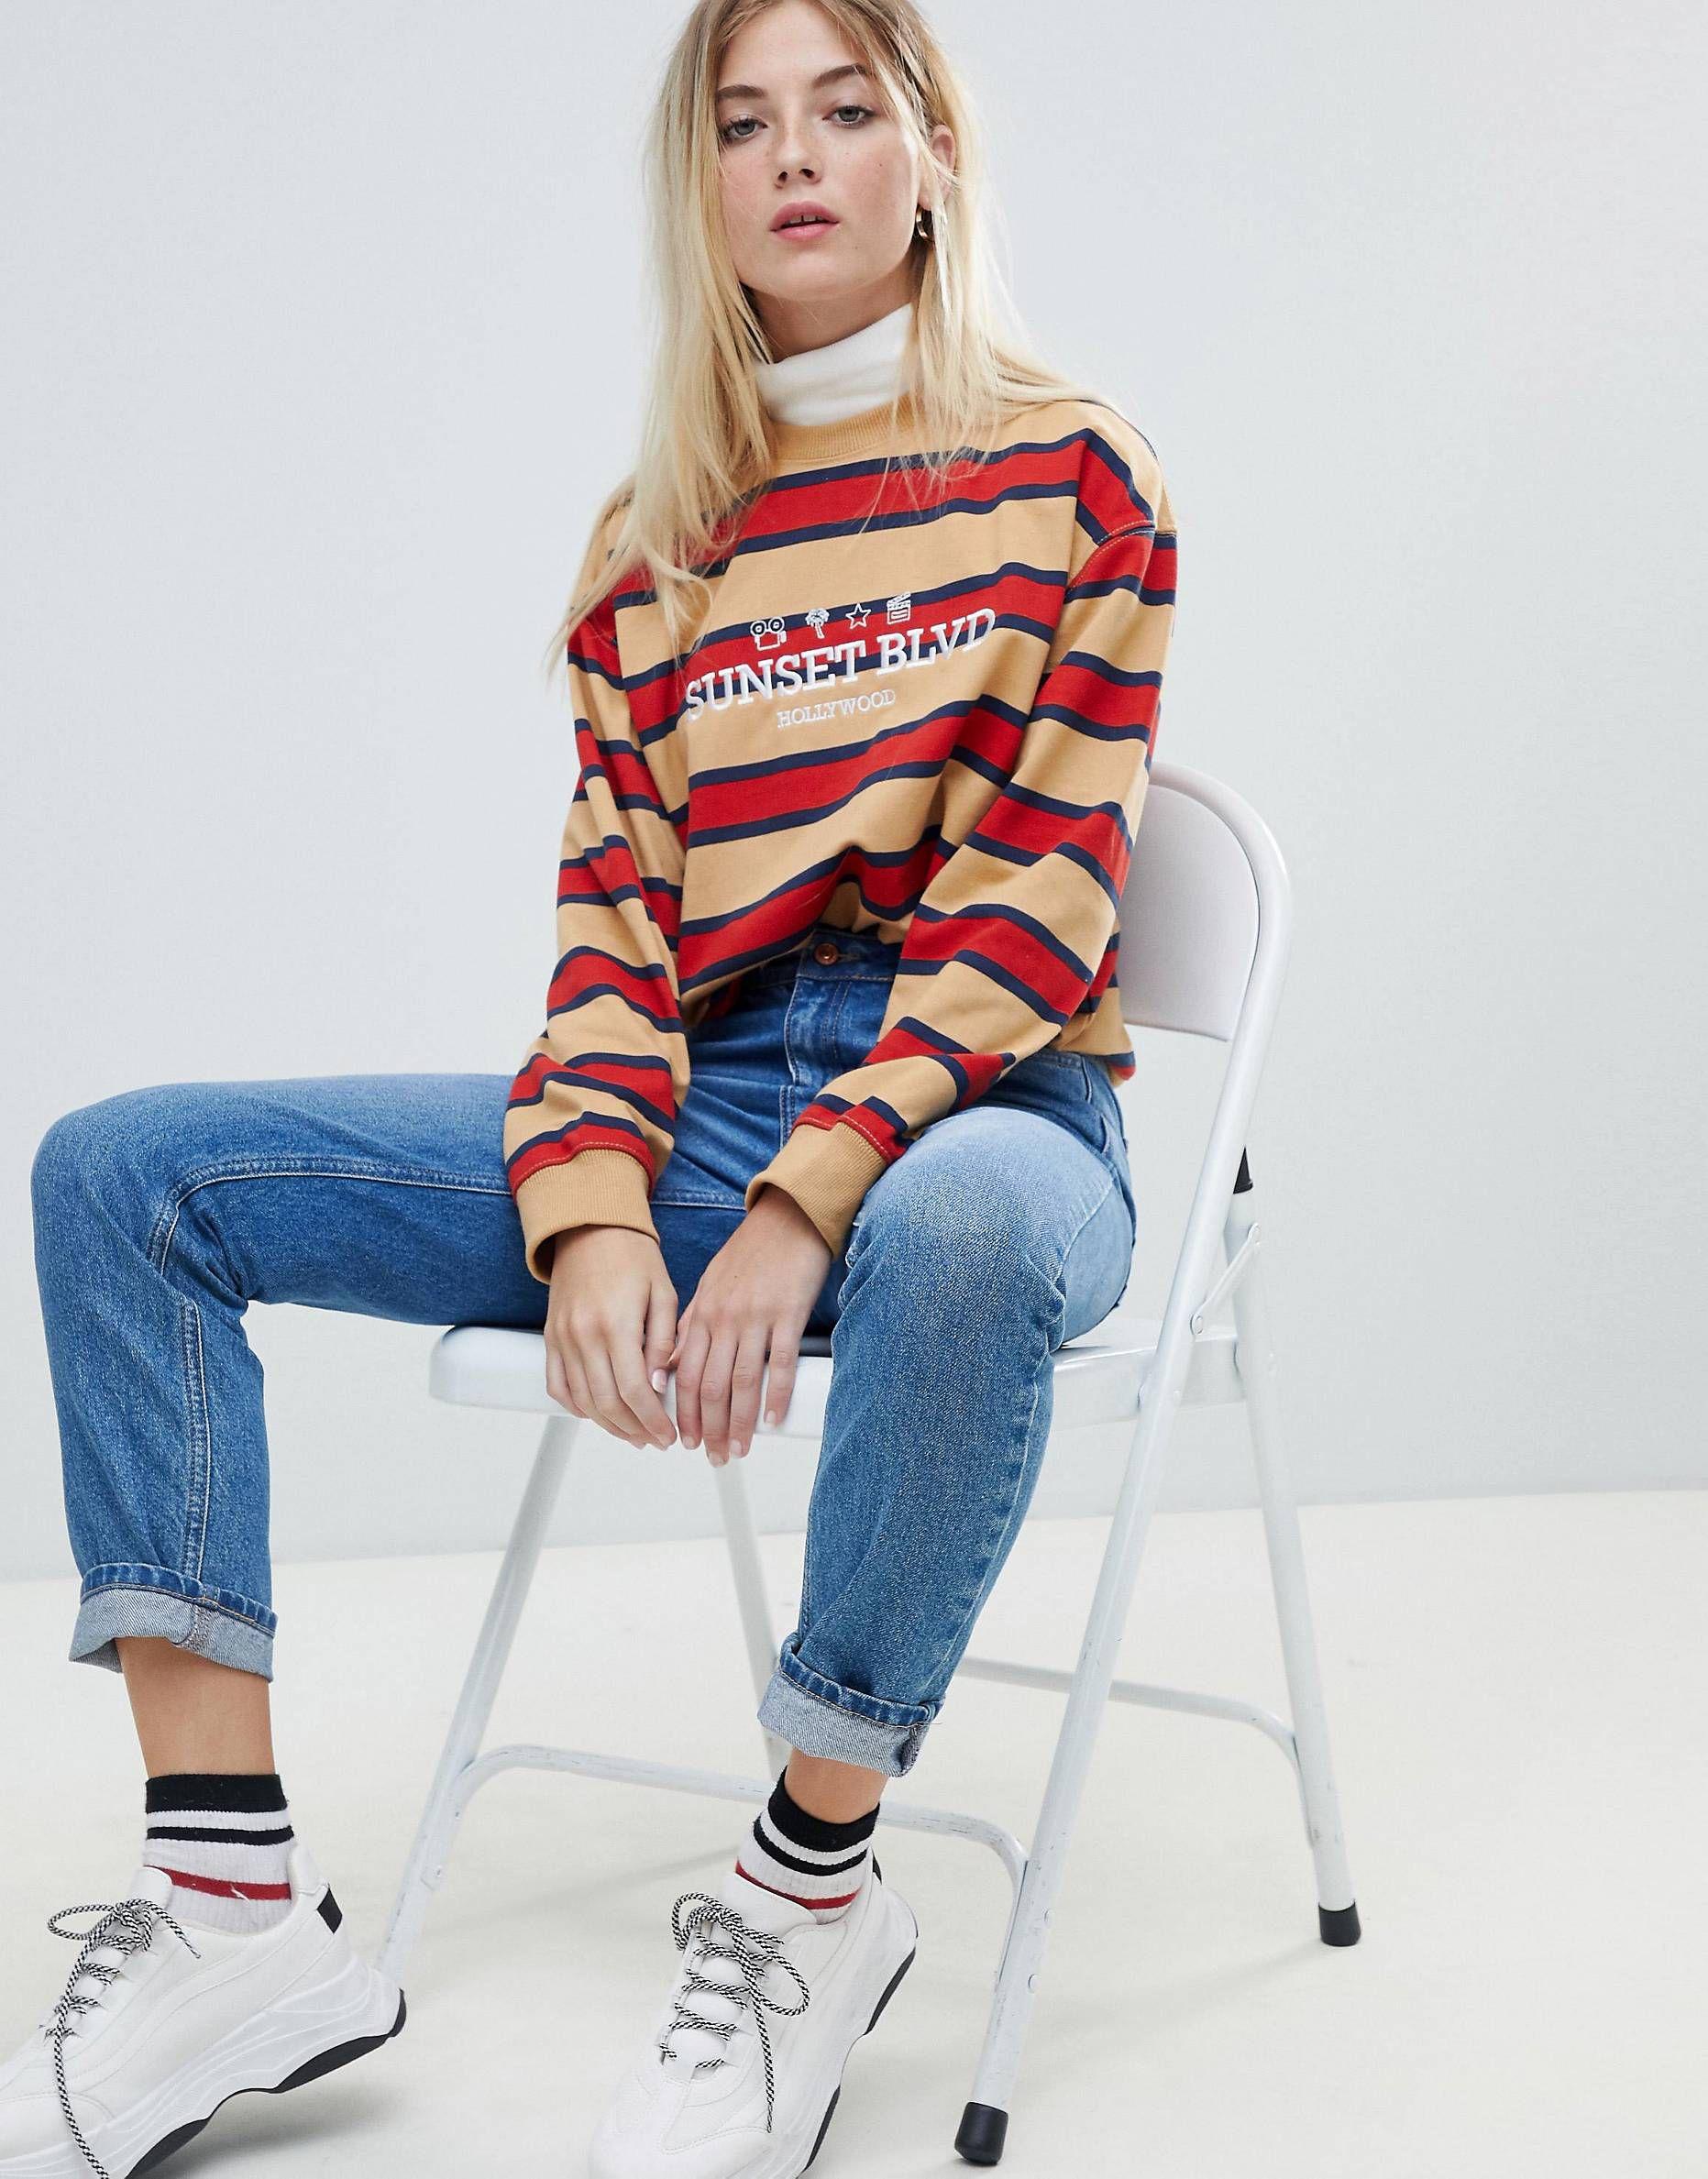 1def18c53a Daisy Street boyfriend sweatshirt with sunset boulevard embroidery ...